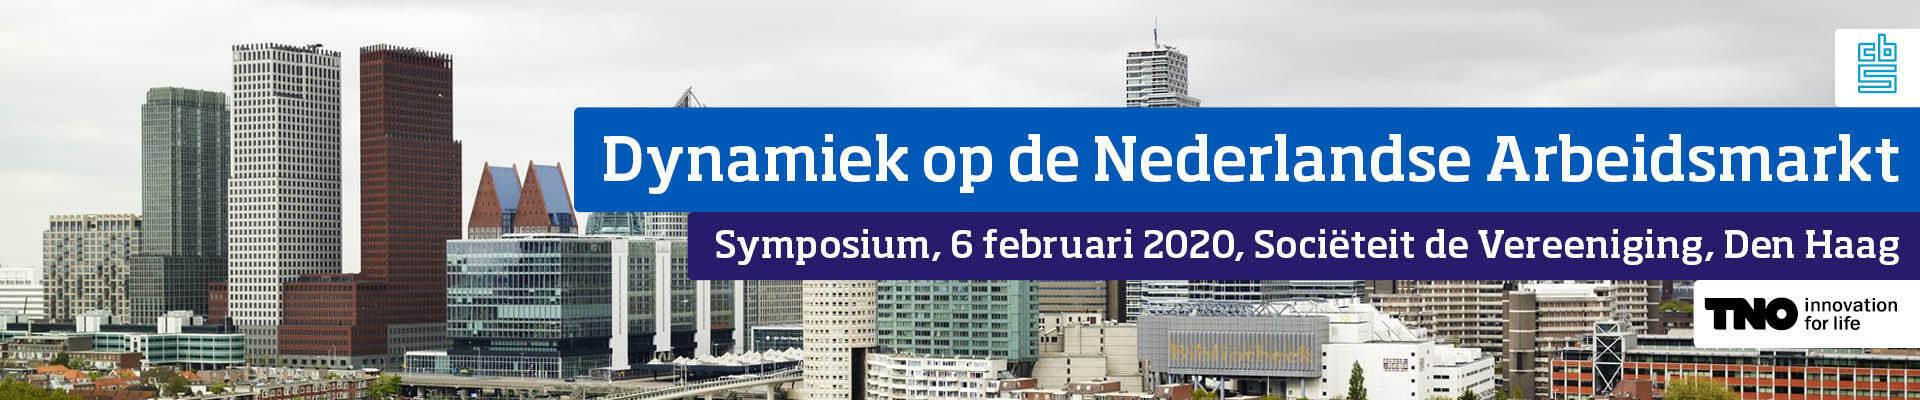 Dynamiek op de Nederlandse arbeidsmarkt